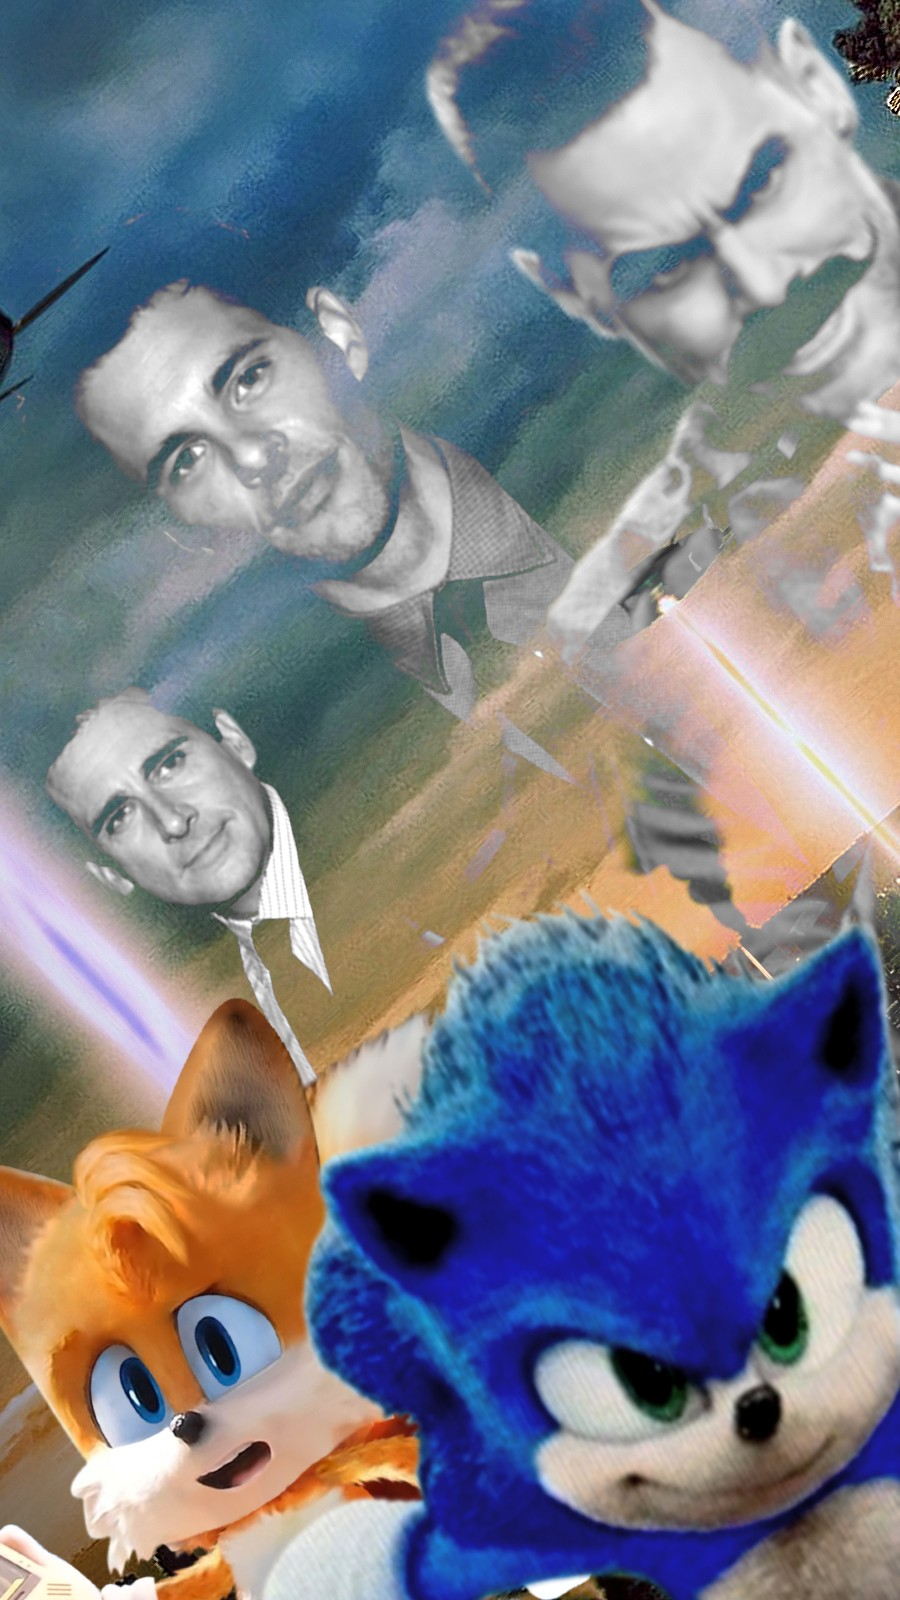 Sonic The Hedgehog Part Ii 2022 By Kadeklodt On Deviantart